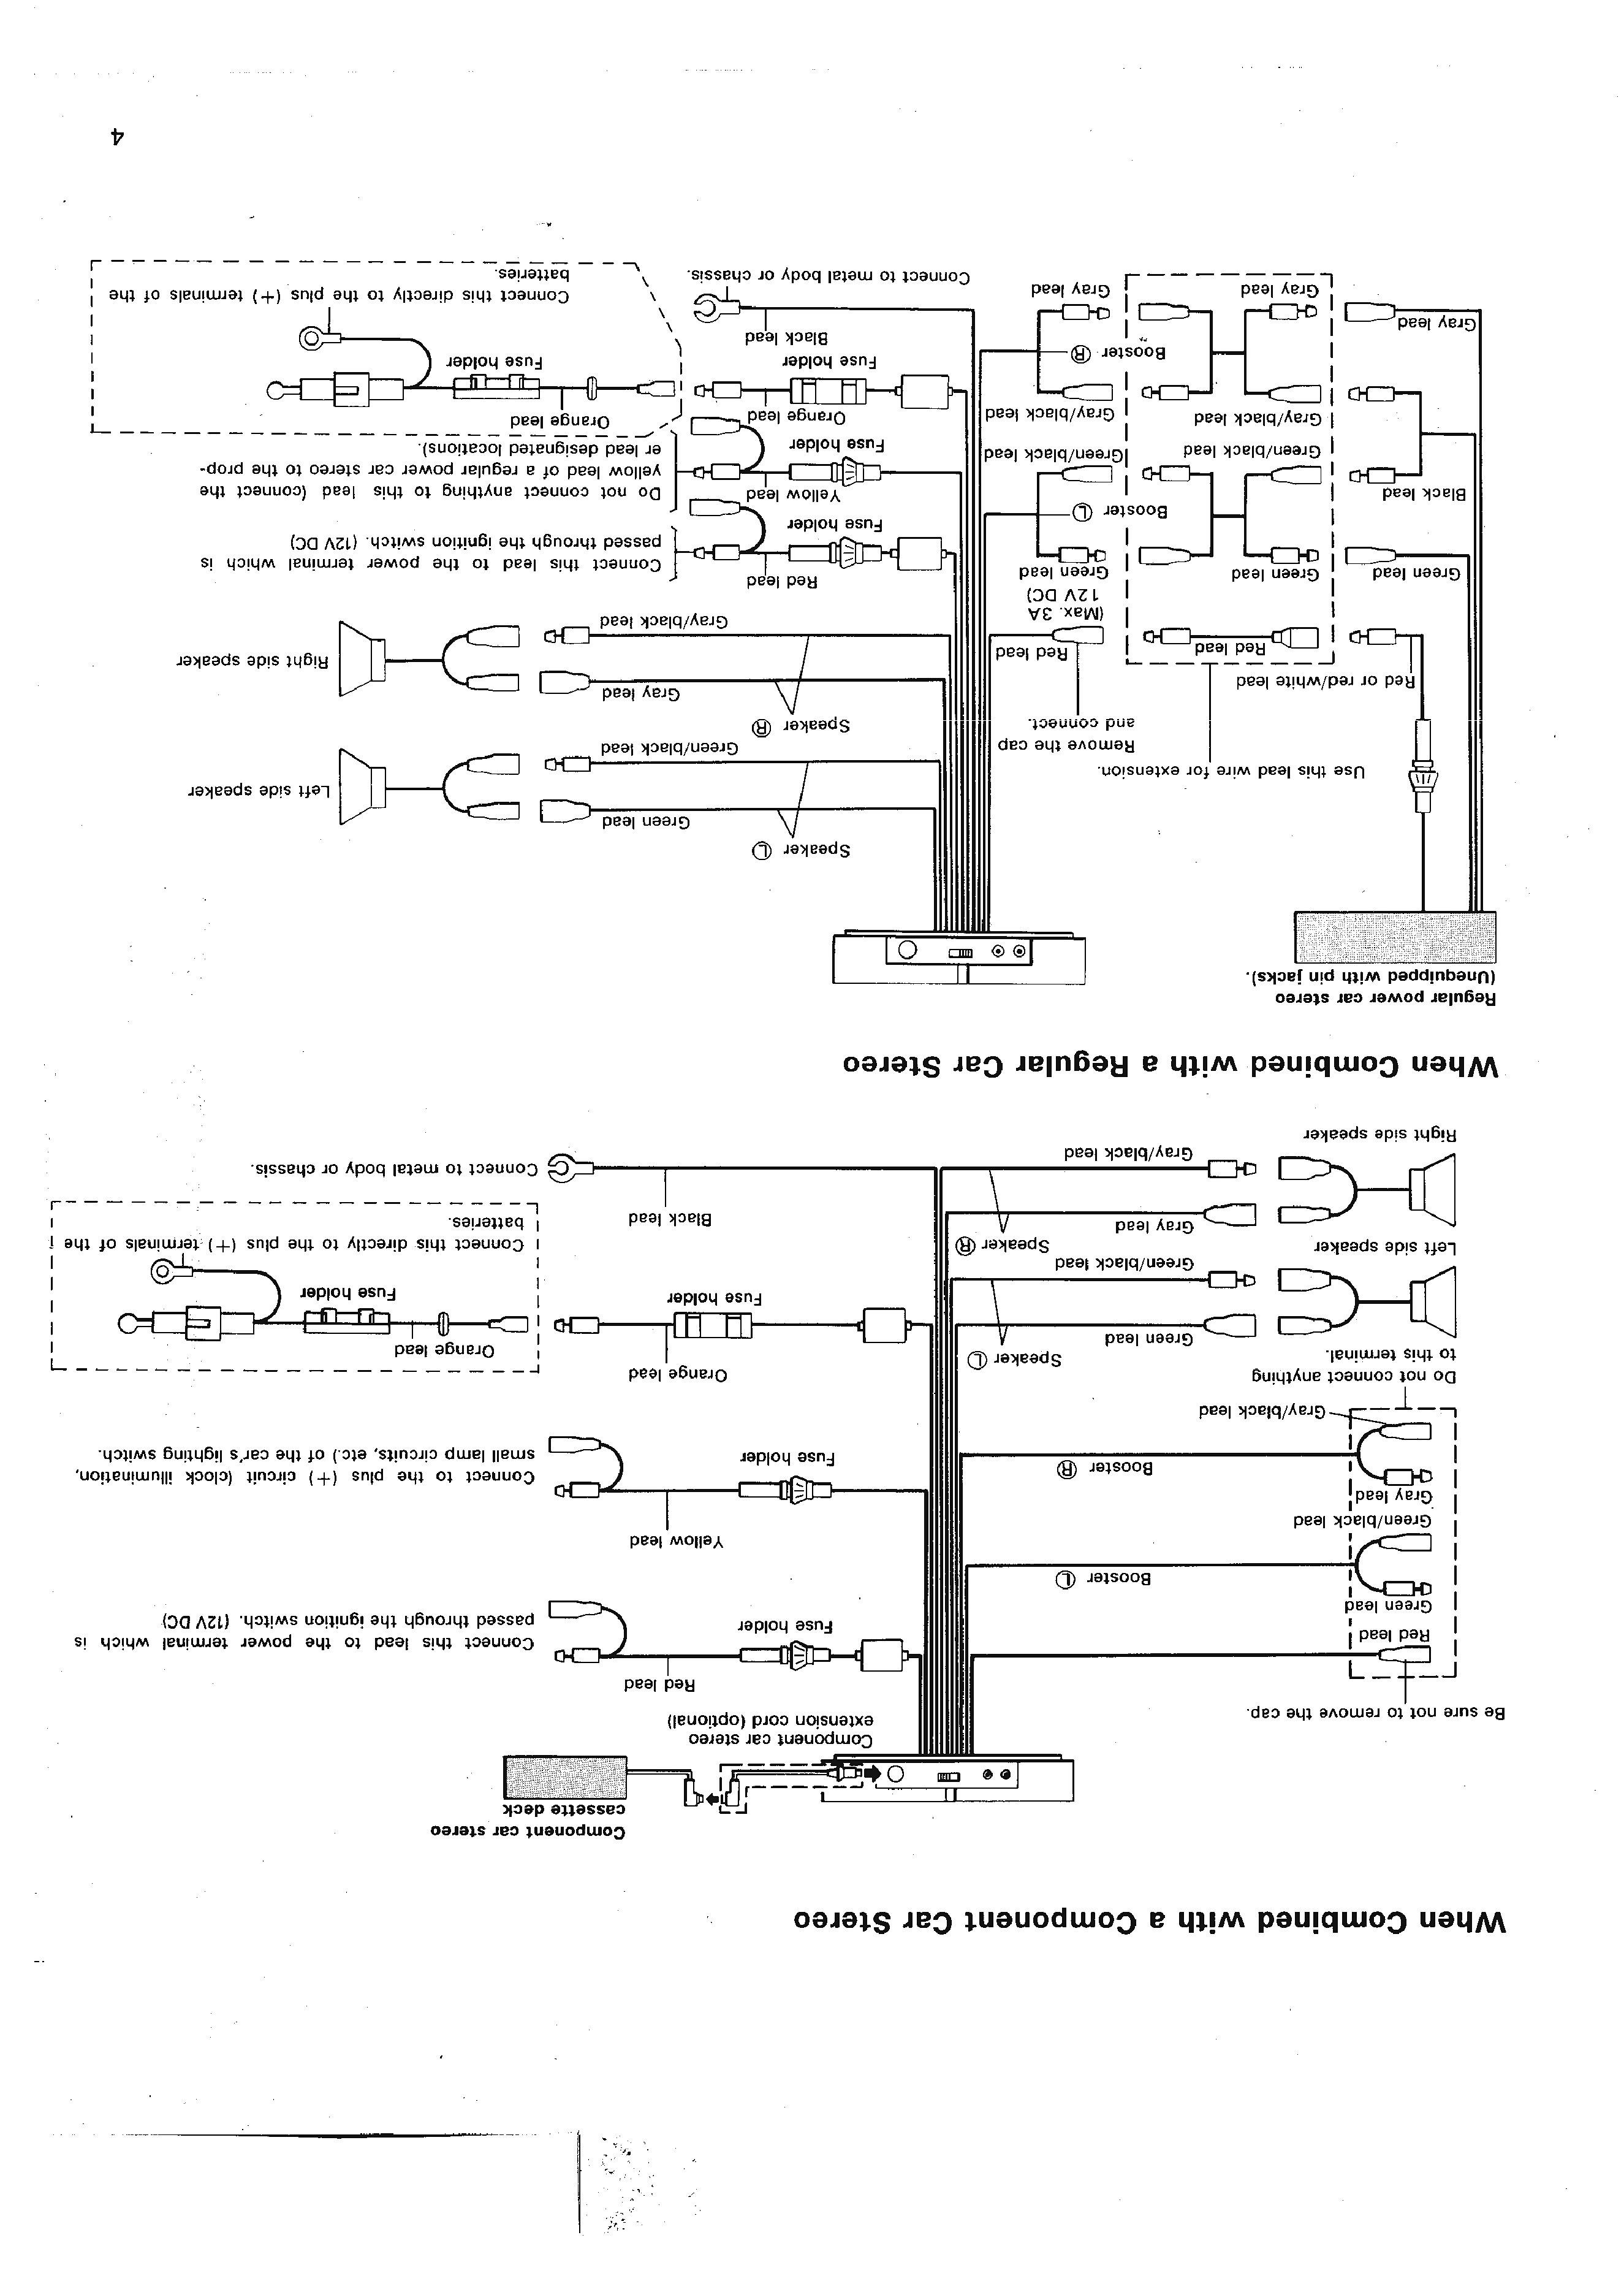 Pioneer Deh X5500hd Wiring Diagram - 2009 Nissan Cube Fuse Diagram -  pipiiing-layout.yenpancane.jeanjaures37.fr | Wiring Mp Diagram Radio Deh P2900 |  | Wiring Diagram Resource